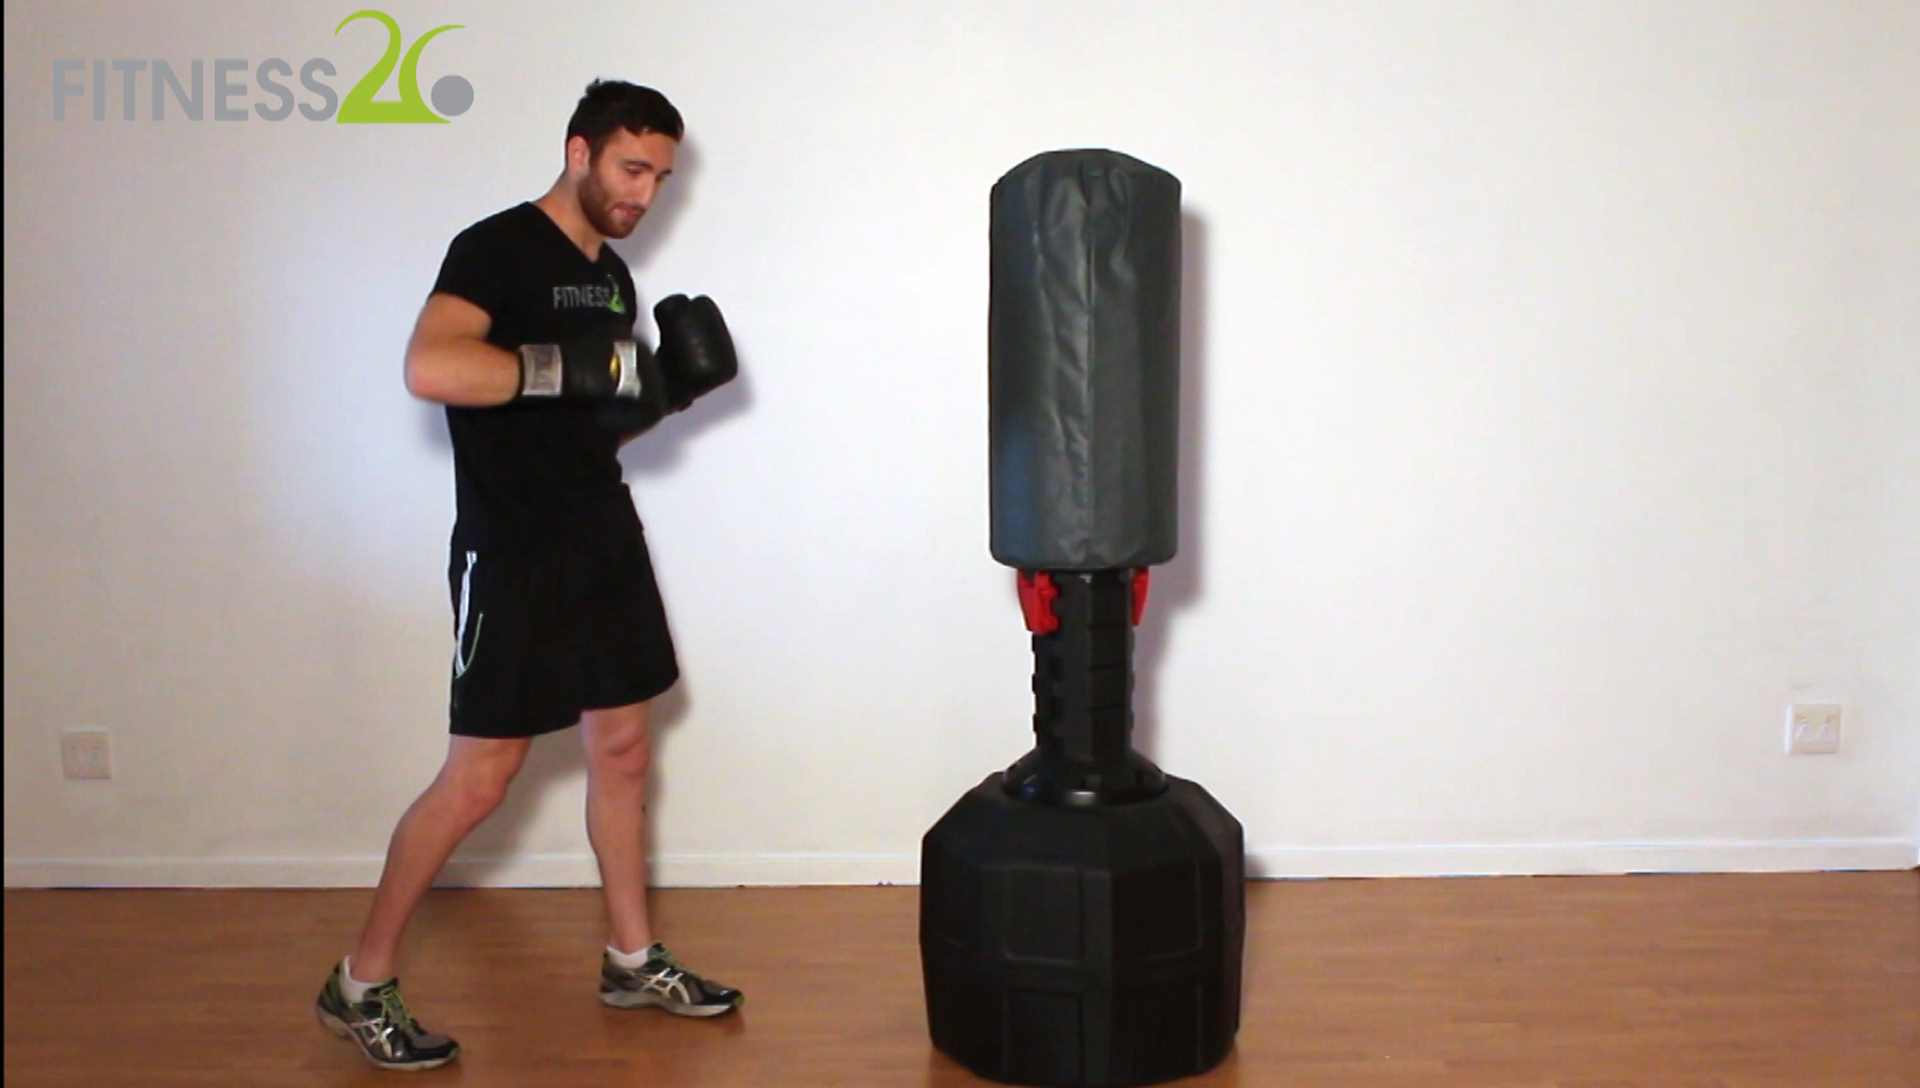 Josh – Using the Boxing bag correctly: Beginners